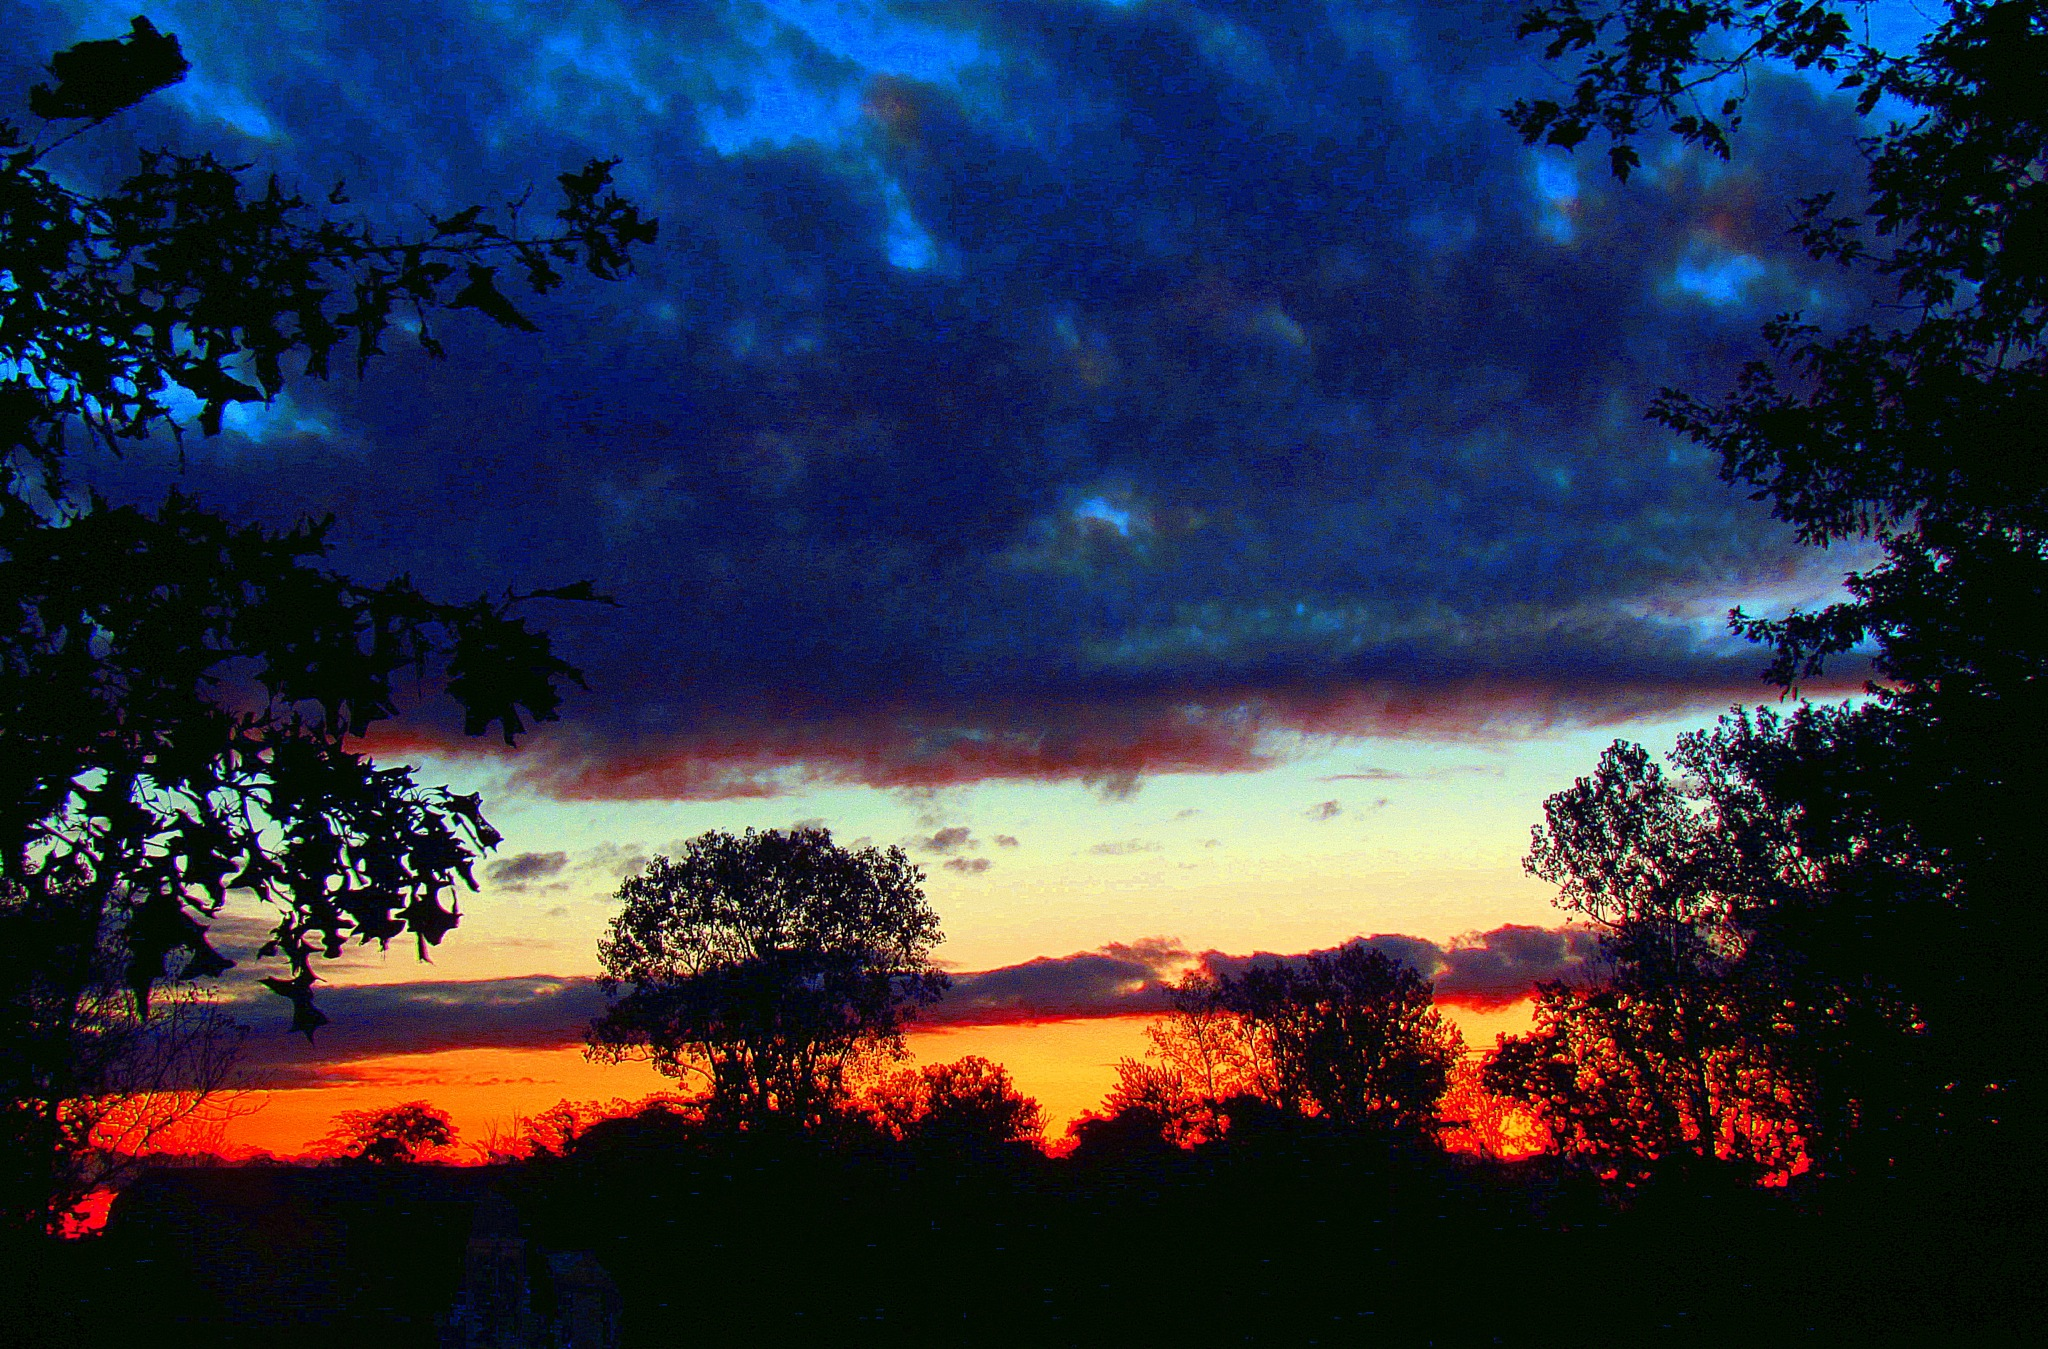 Early Sunrise by bellamahri